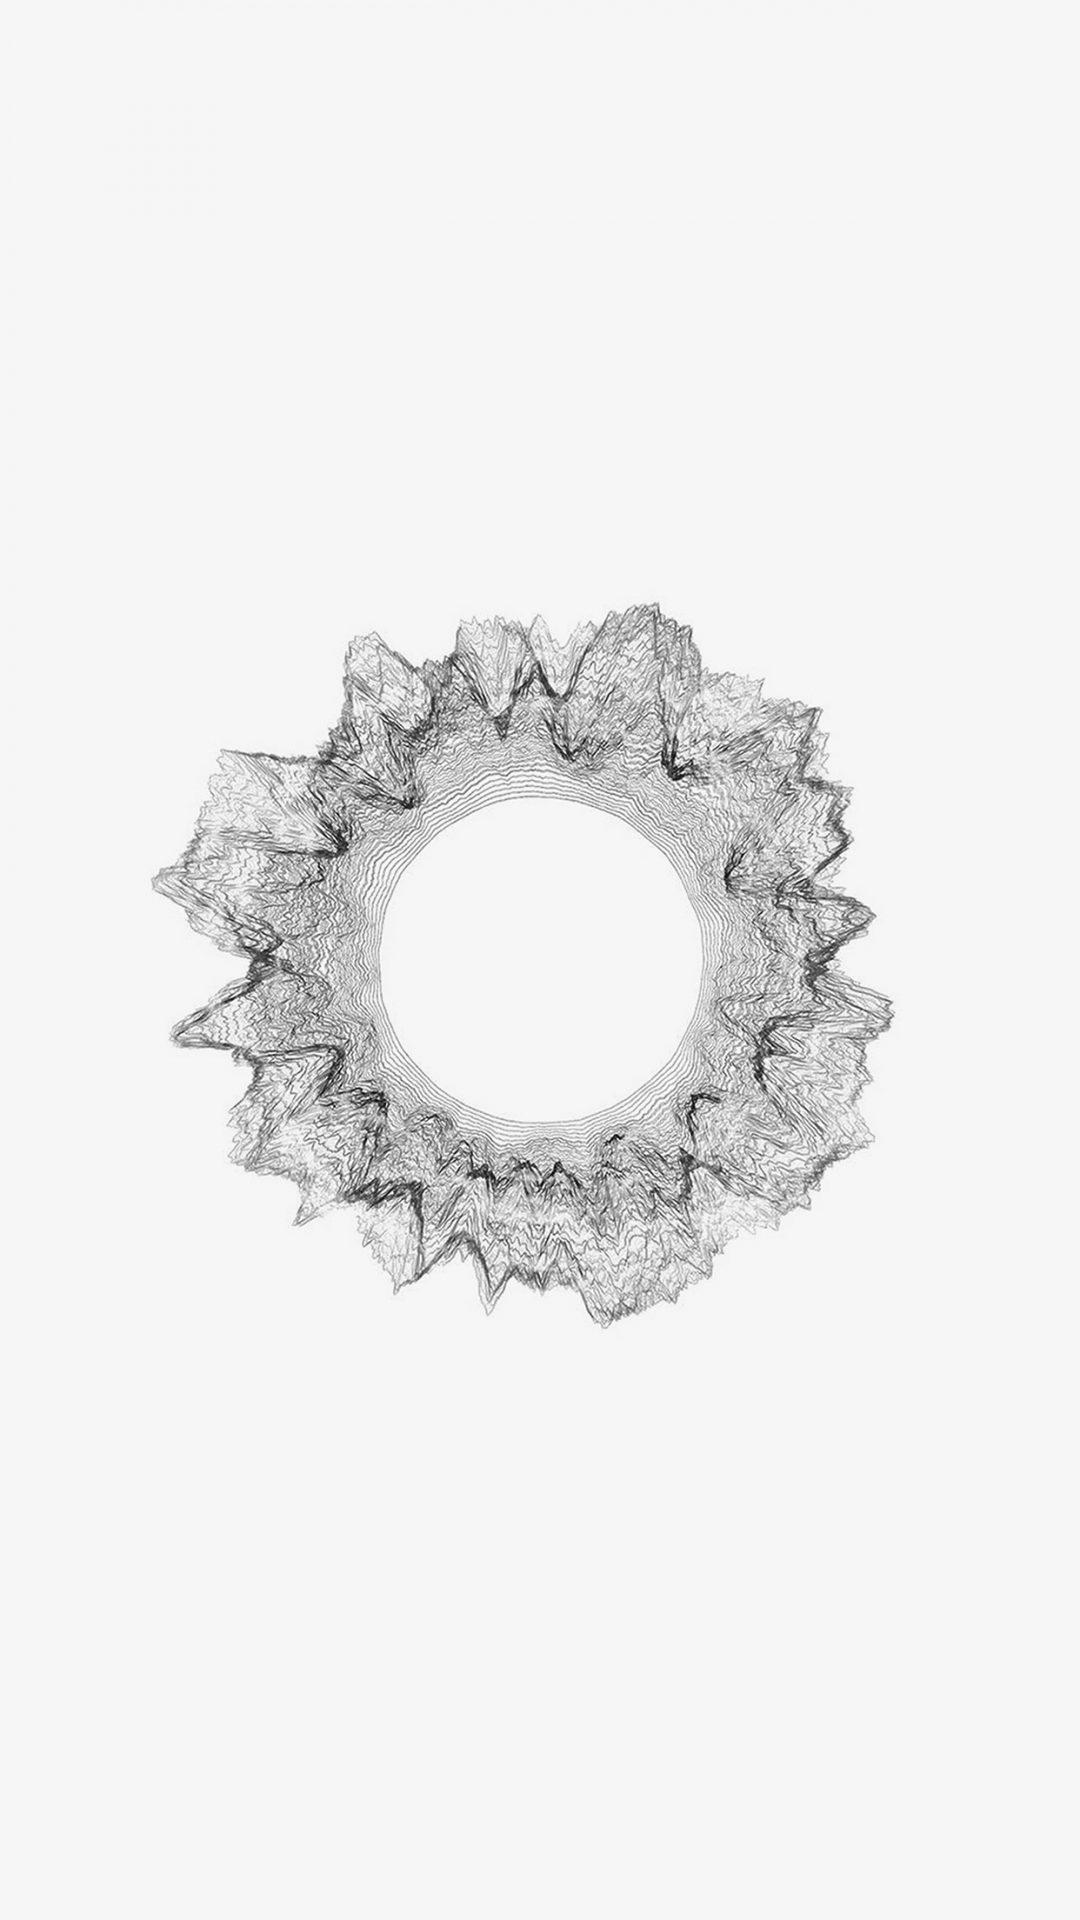 White Bw Circle Minimal Abstract Digital Art Pattern